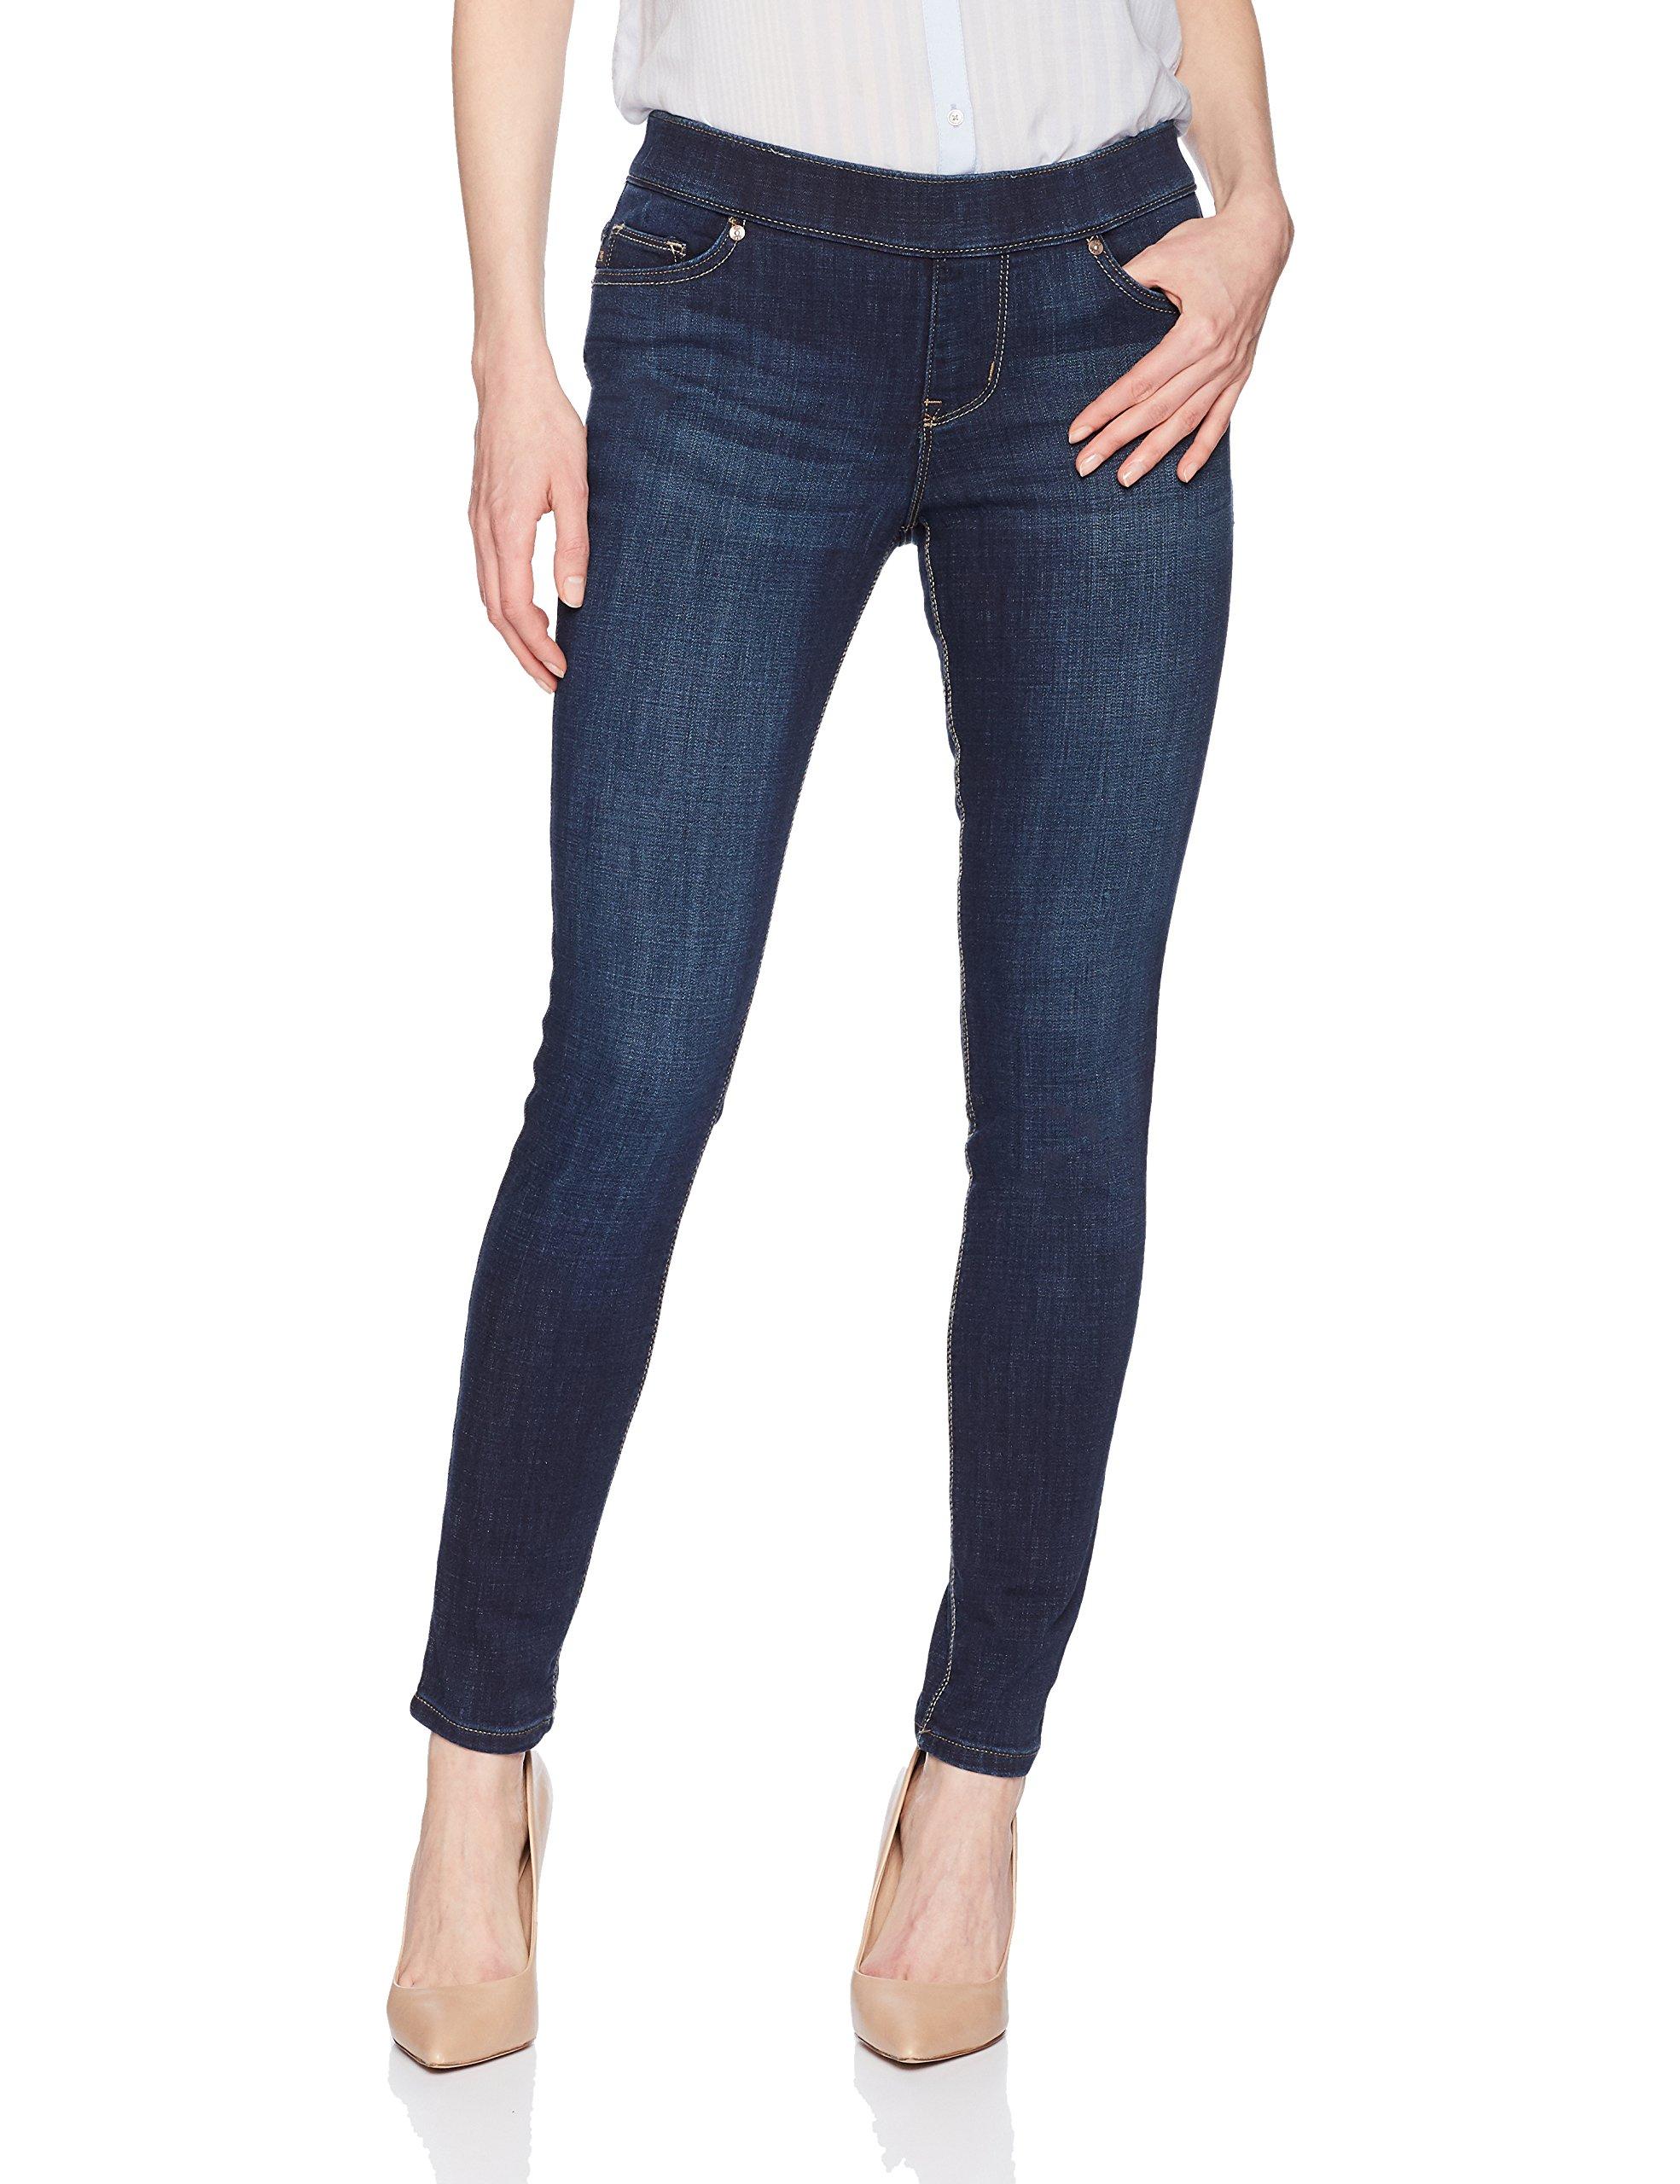 LEE Women's Modern Series Midrise Fit Dream Jean Harmony Pull On Legging, Electric, 14 Short